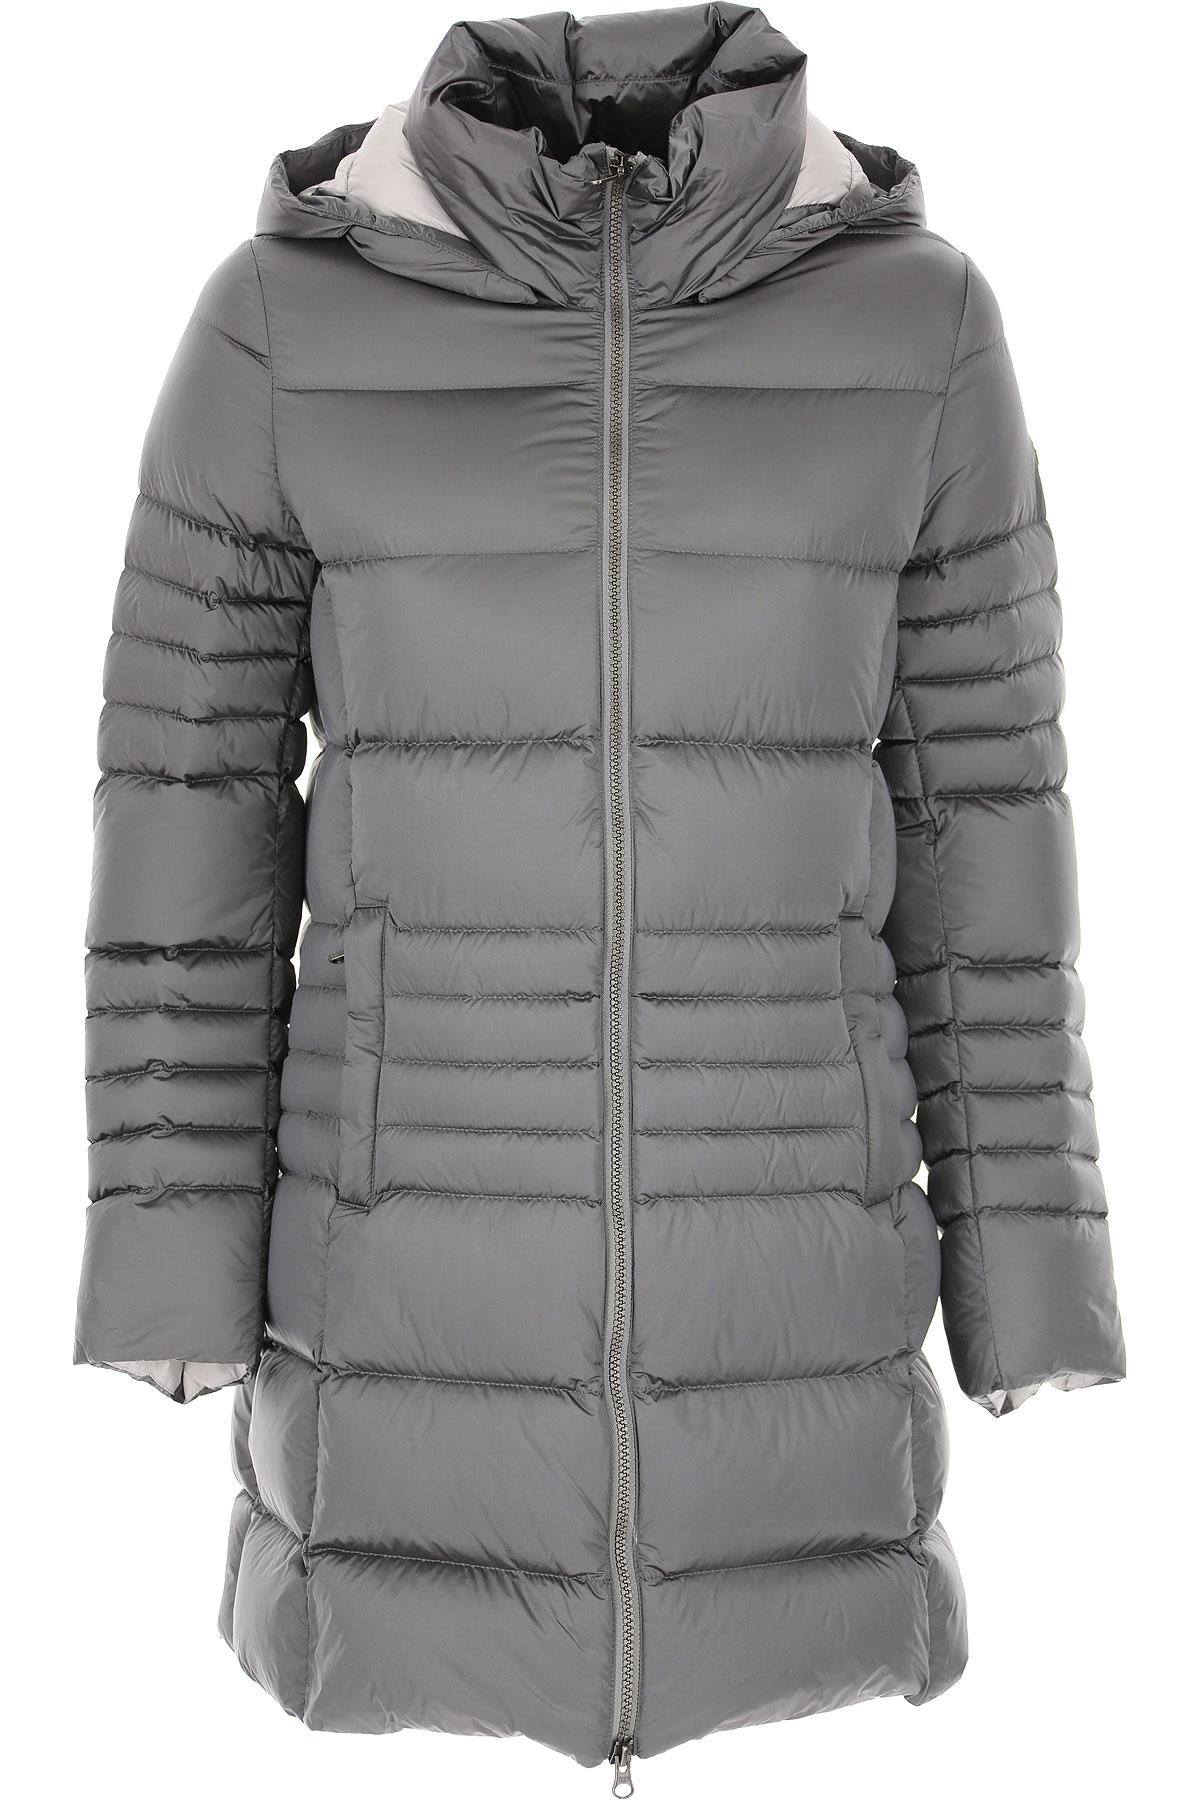 Colmar Down Jacket for Women, Puffer Ski Jacket, Medium Pearl Grey, polyamide, 2019, 12 6